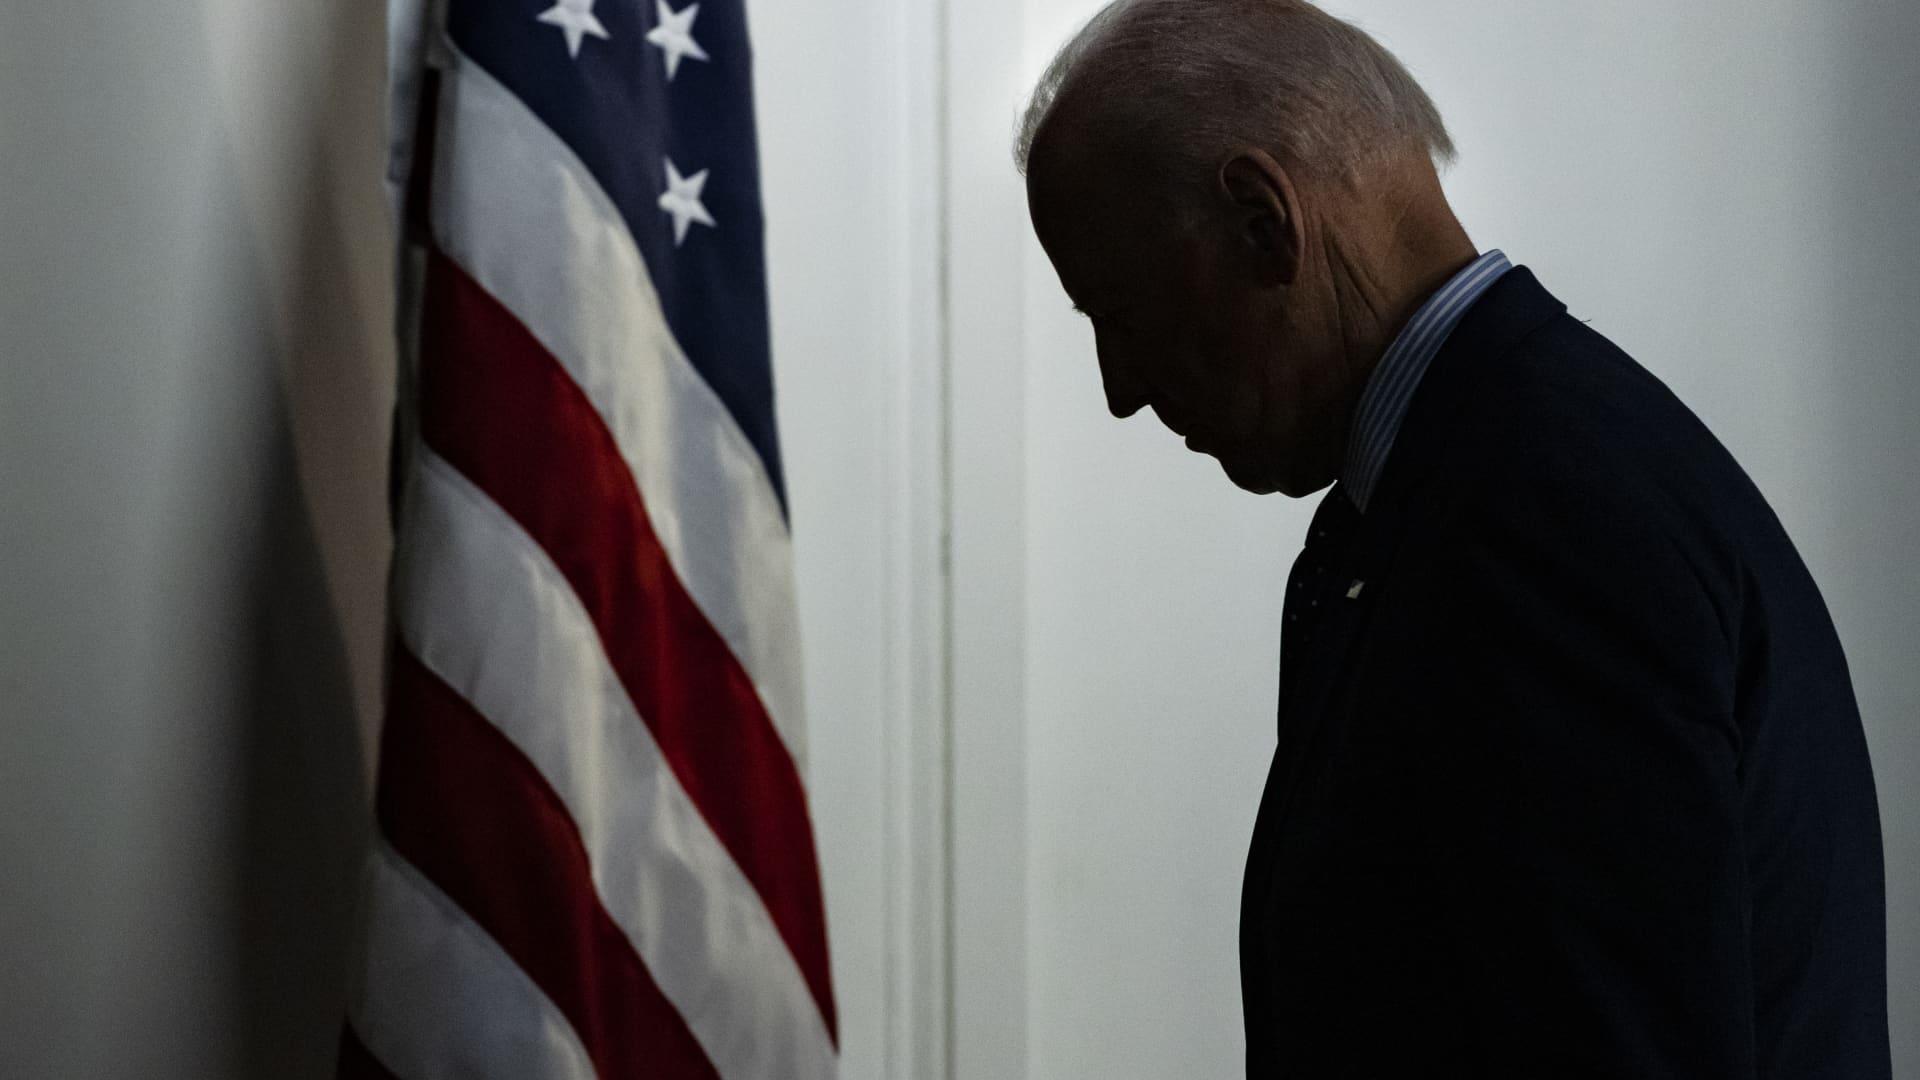 U.S. President Joe Biden departs after speaking in the Eisenhower Executive Office Building in Washington, D.C., on Wednesday, June 2, 2021.